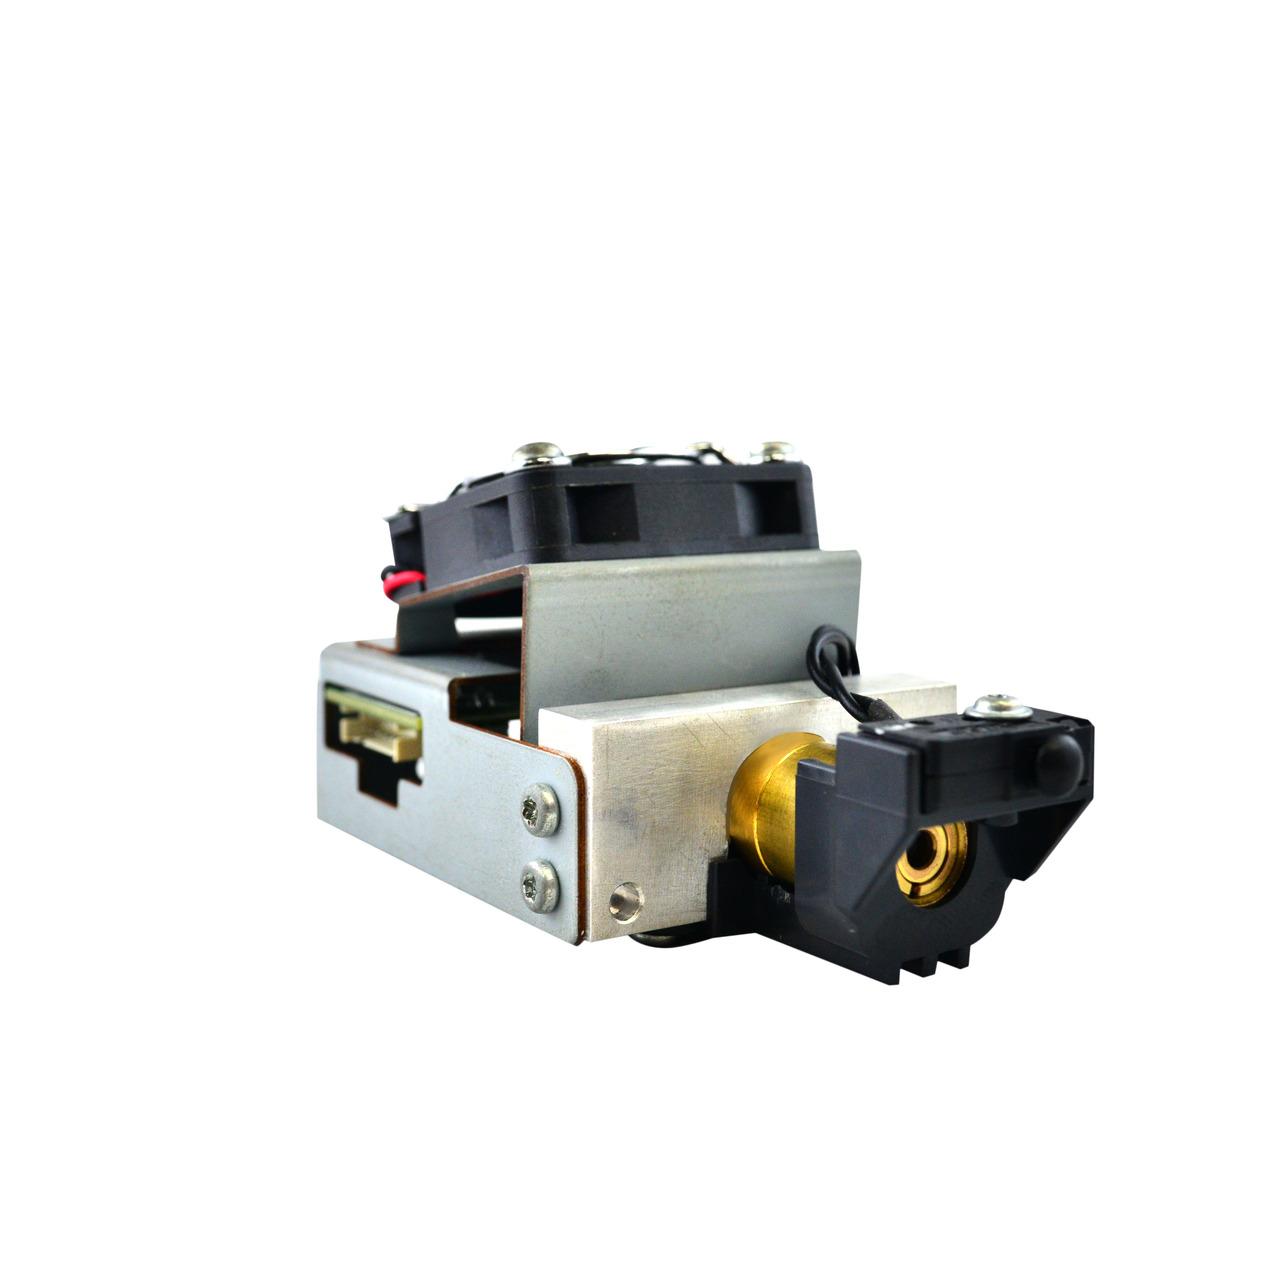 XYZprinting Laser-Gravurmodul für 3D-Drucker da Vinci Jr- Pro X+